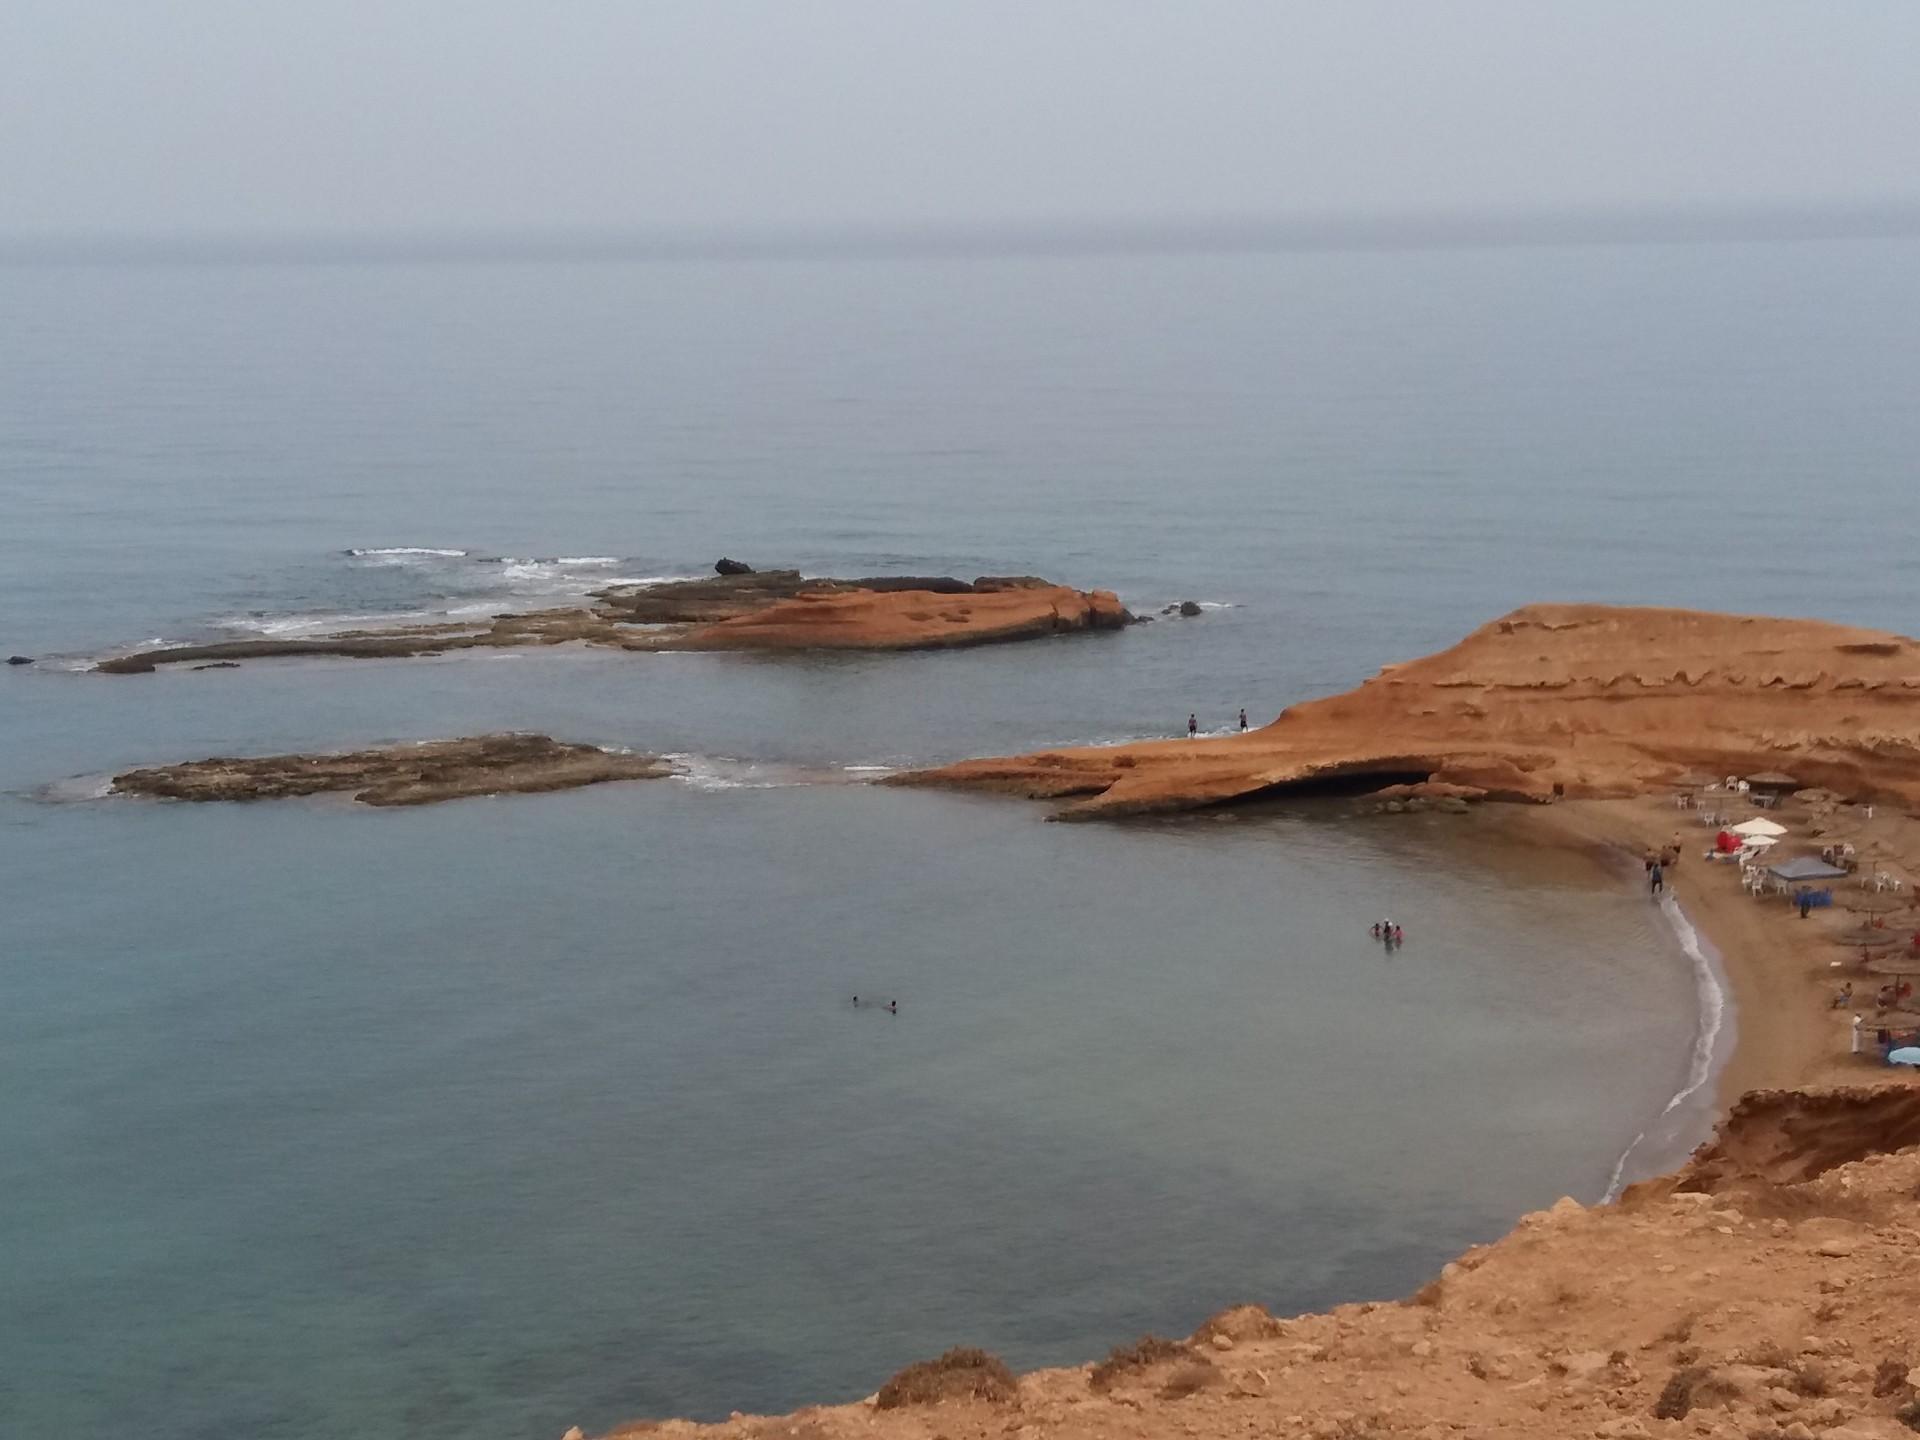 Saïdia, Morocco